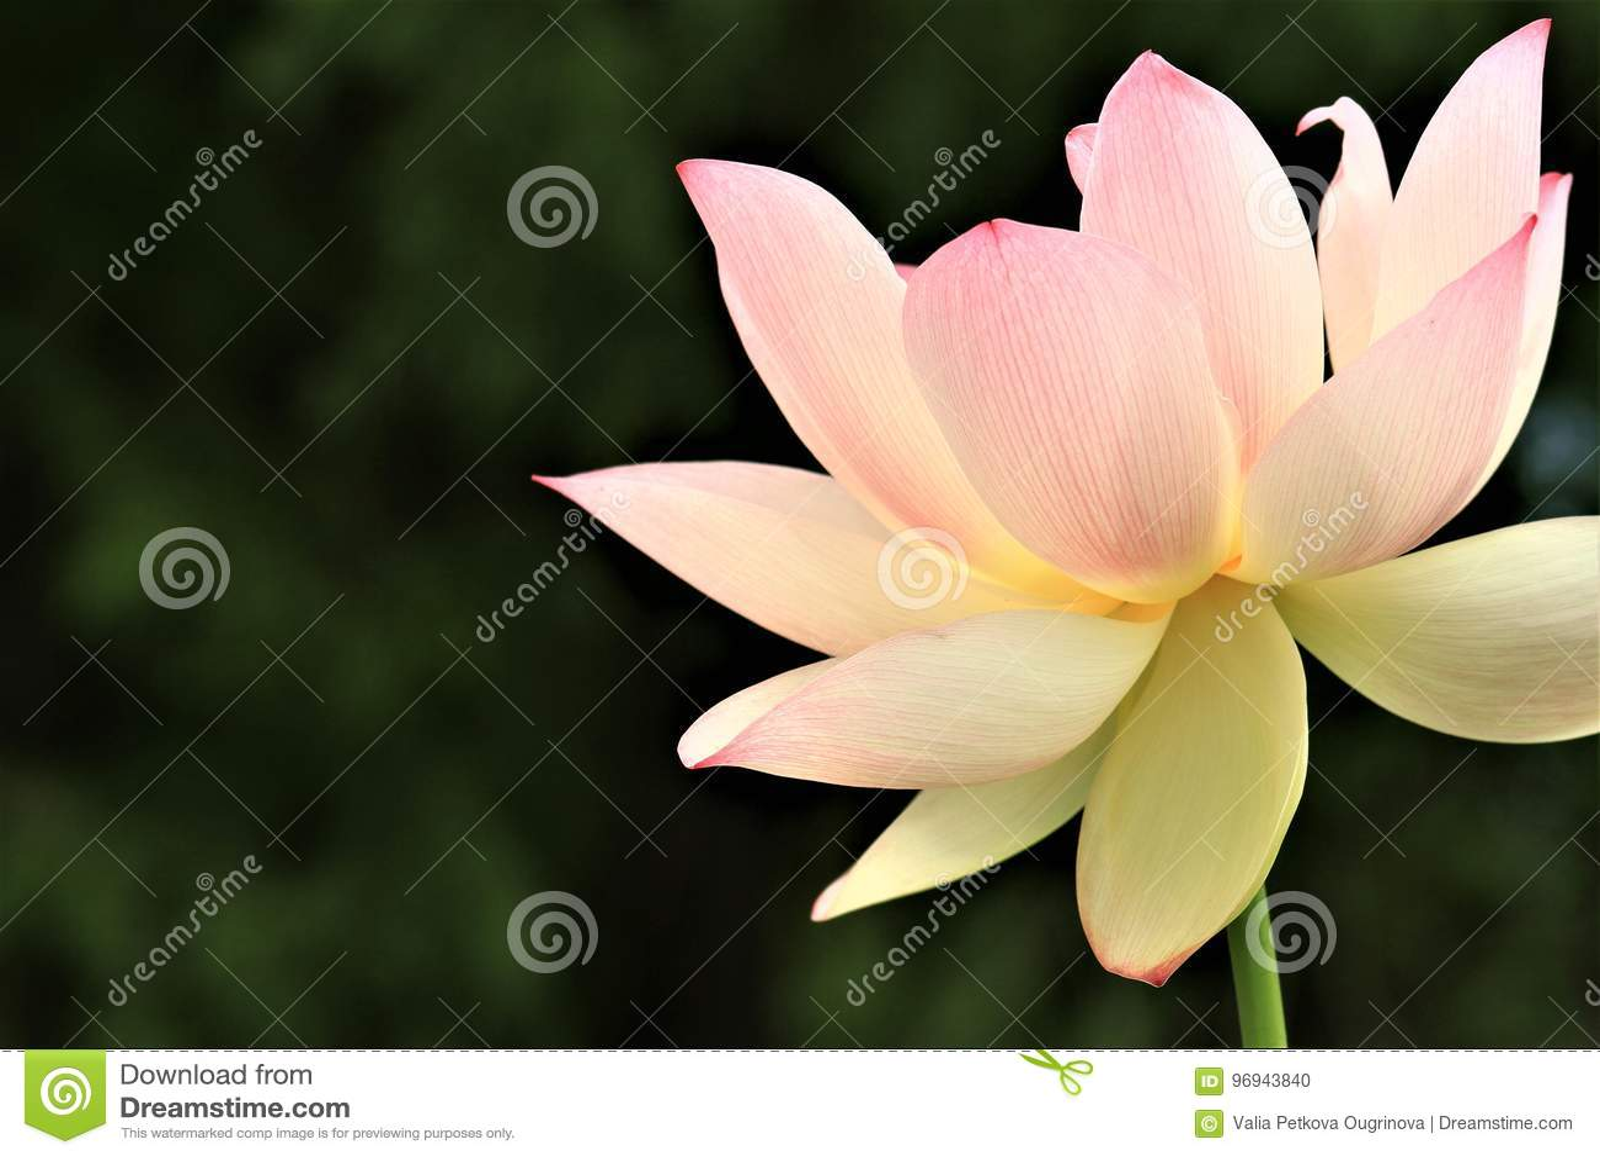 The Sacred Lotus Stock Photo Image Of Lotus Kenilworth 96943840